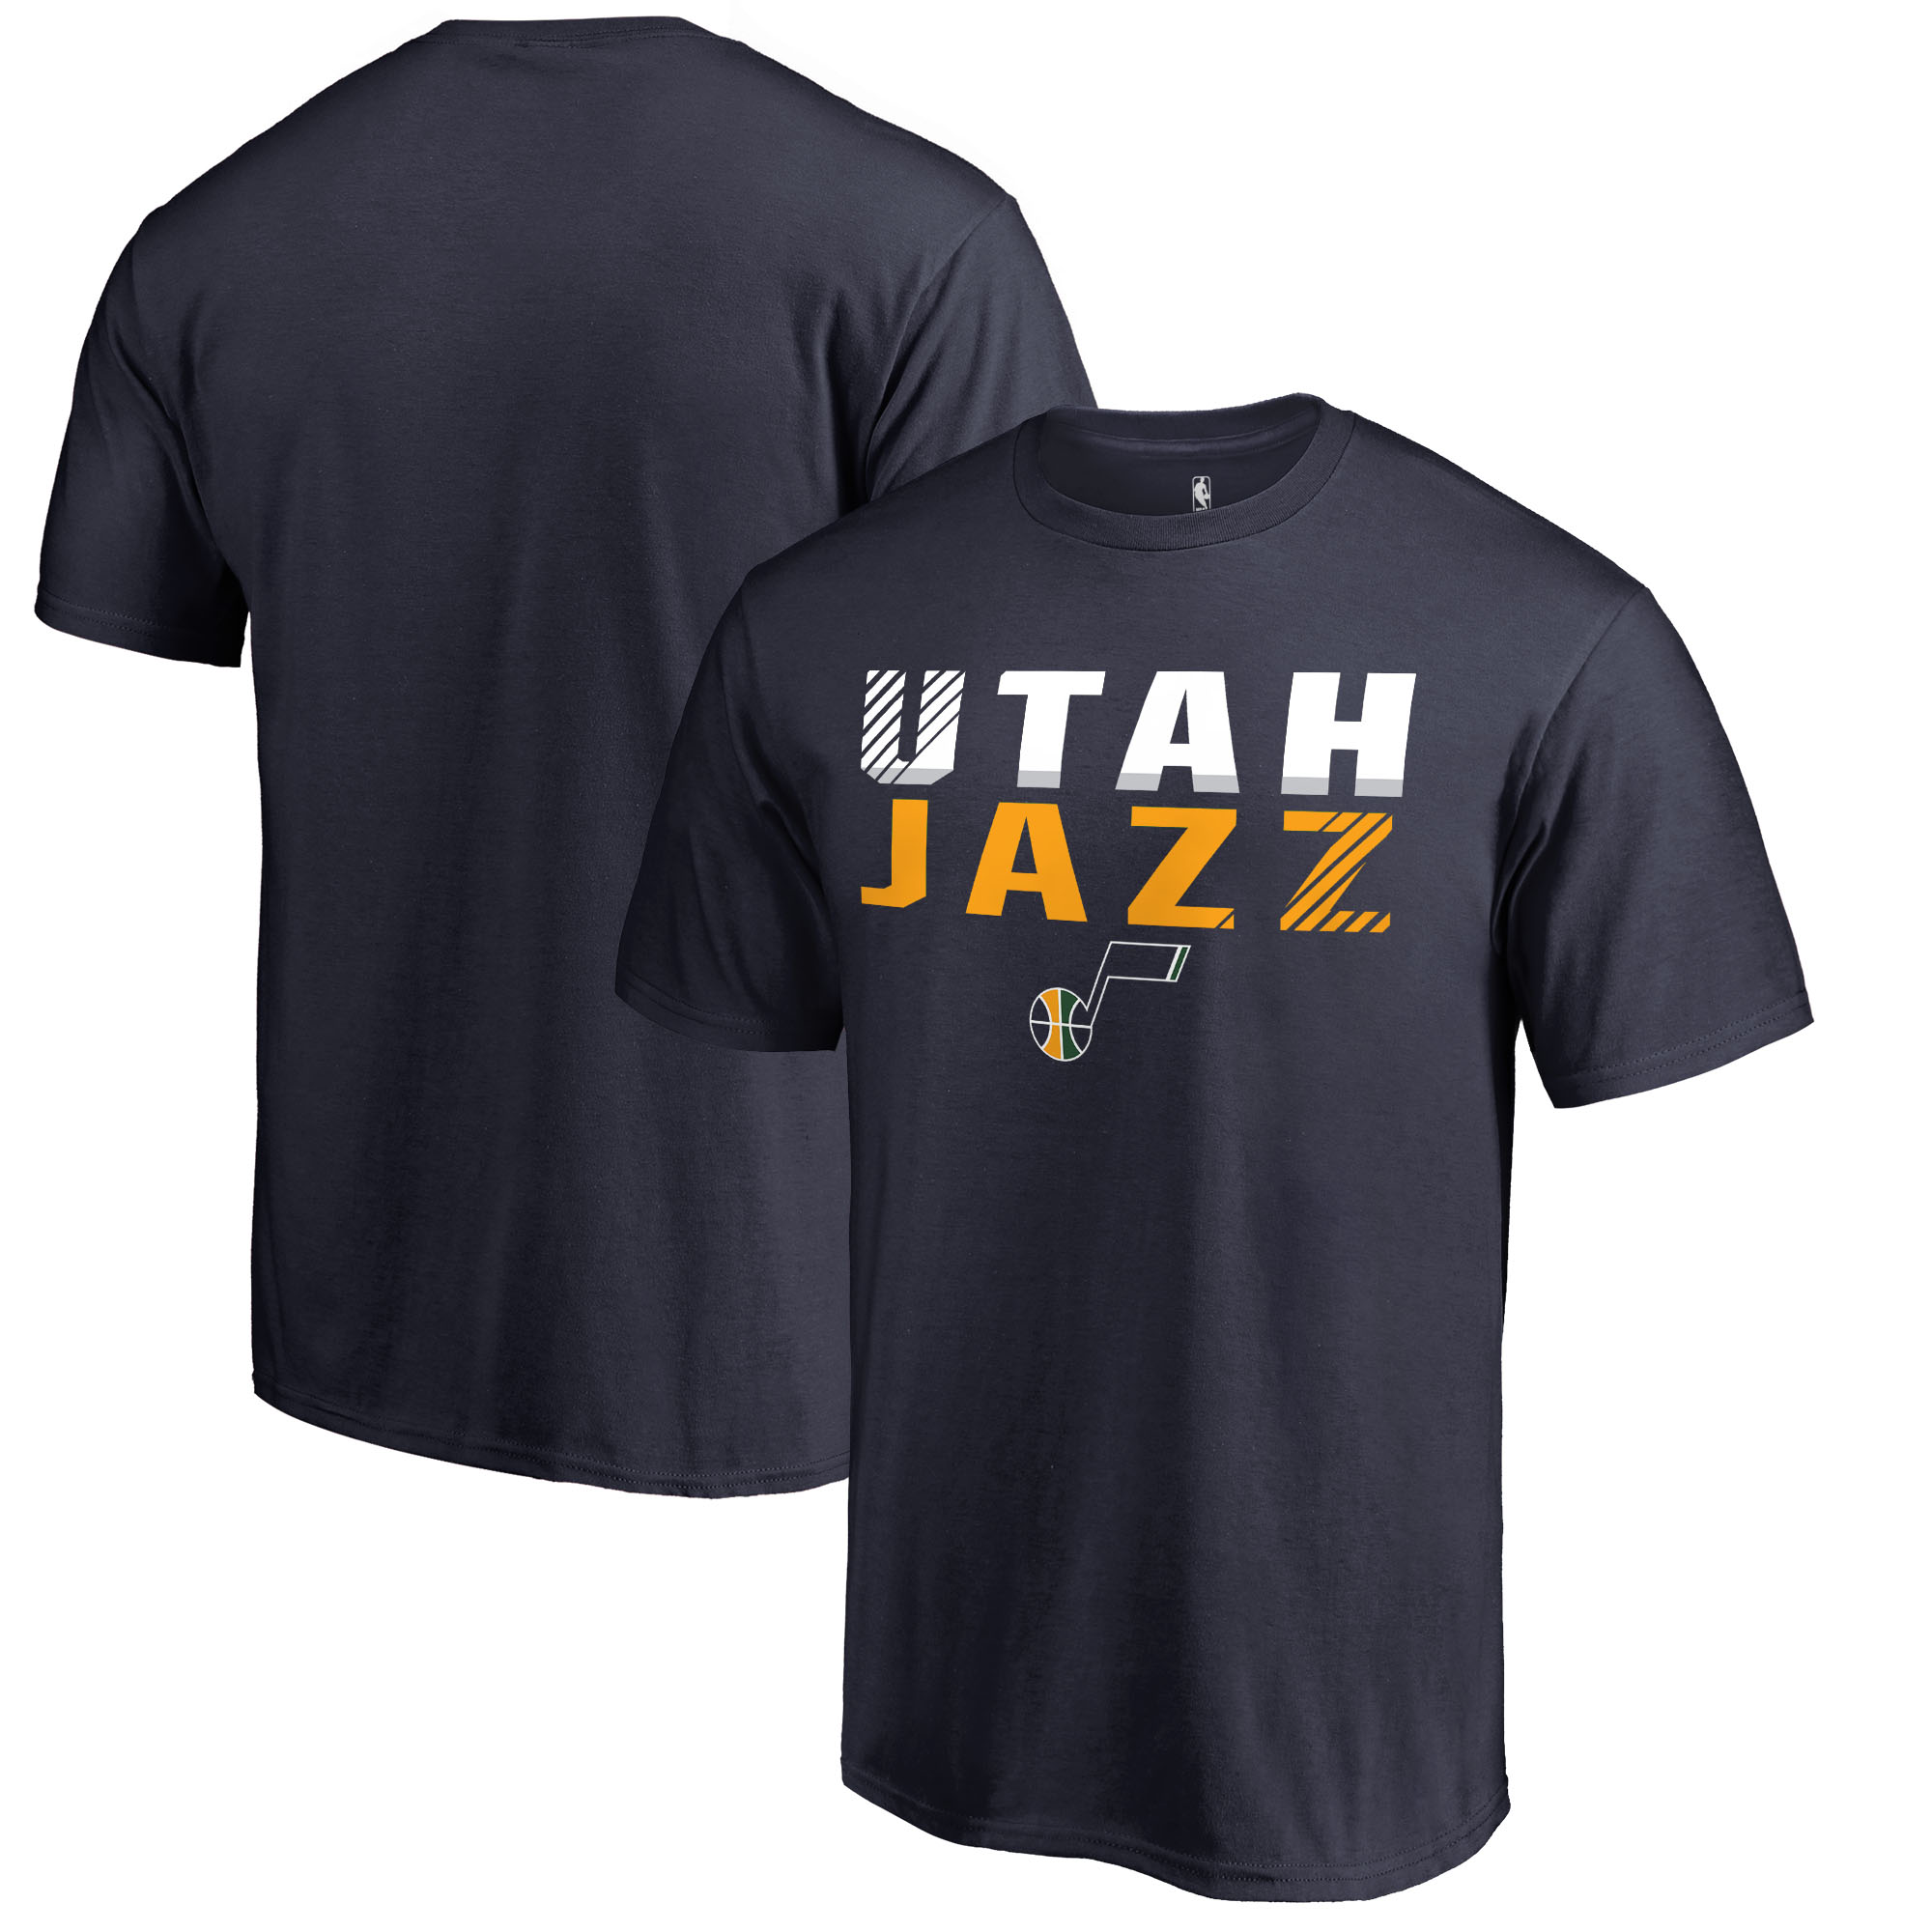 Utah Jazz Fanatics Branded Fade Out T-Shirt - Navy